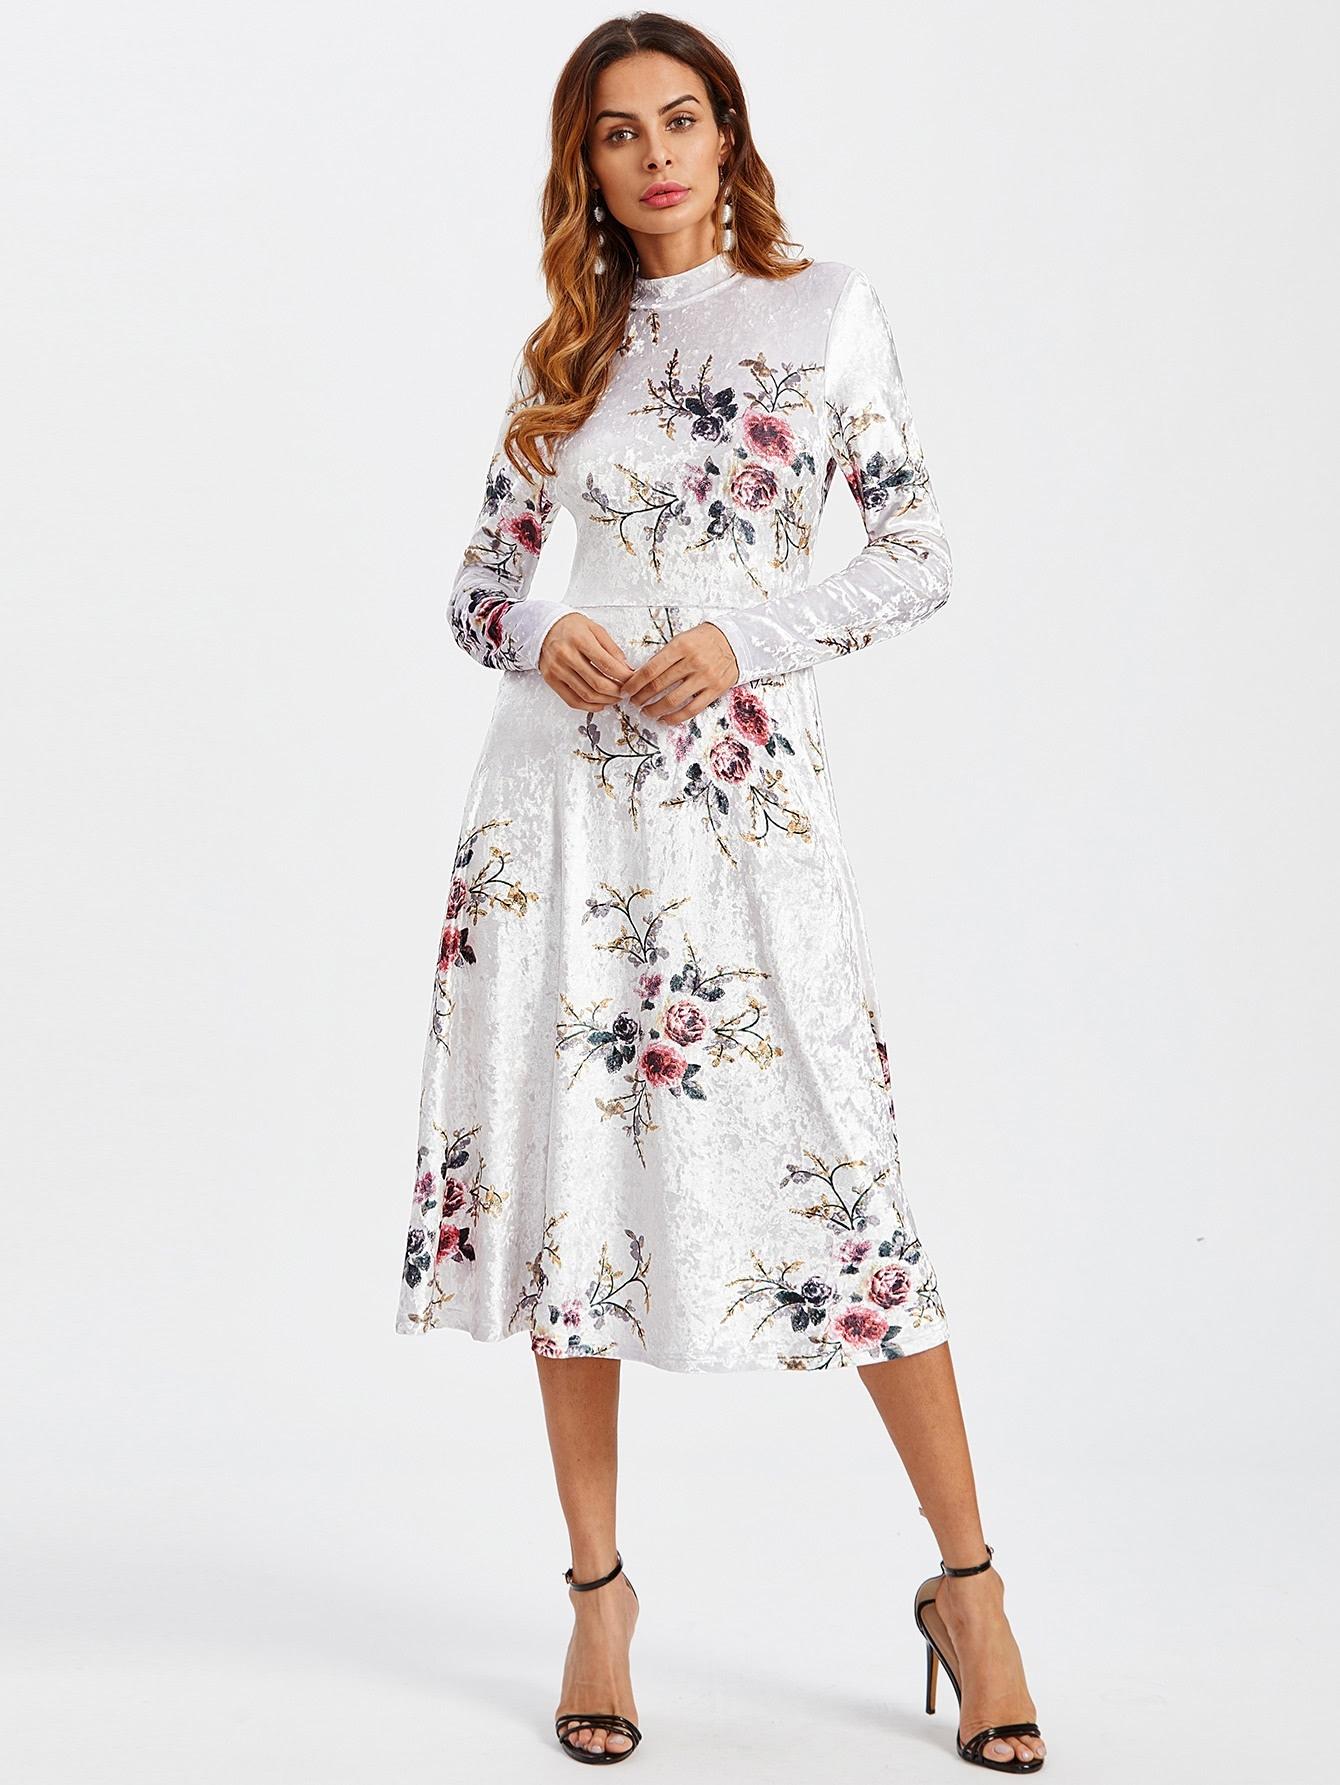 Designer Luxurius Kleid Lang Blumen Boutique10 Top Kleid Lang Blumen Galerie